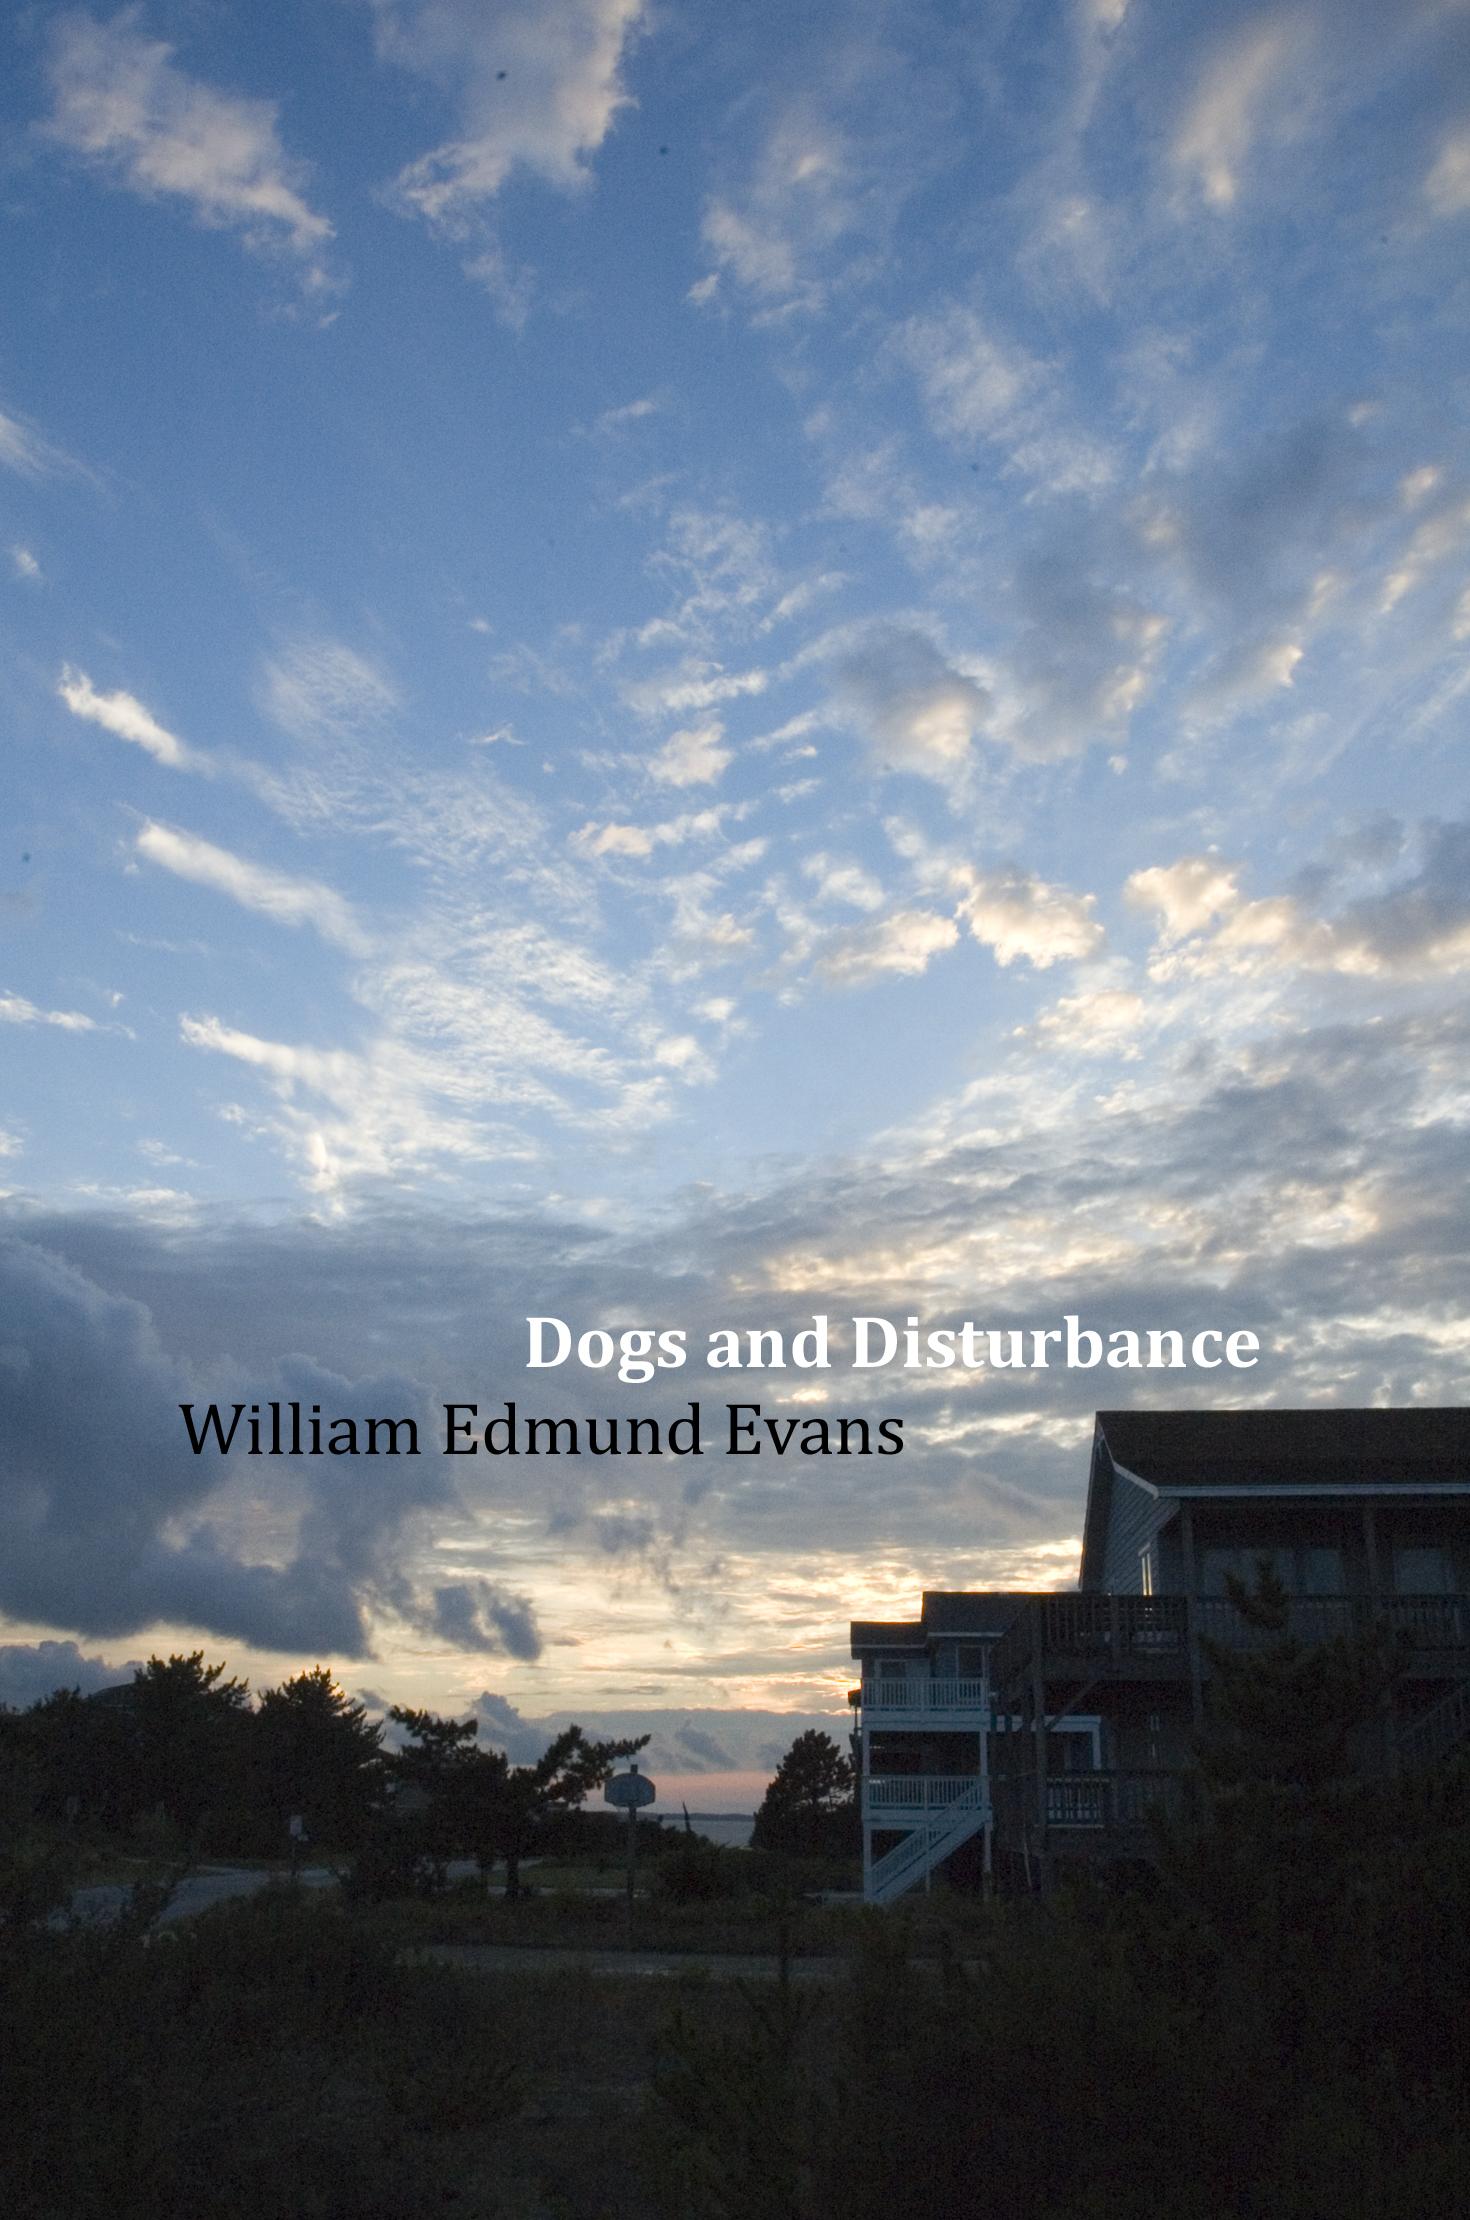 Dogs and Disturbance